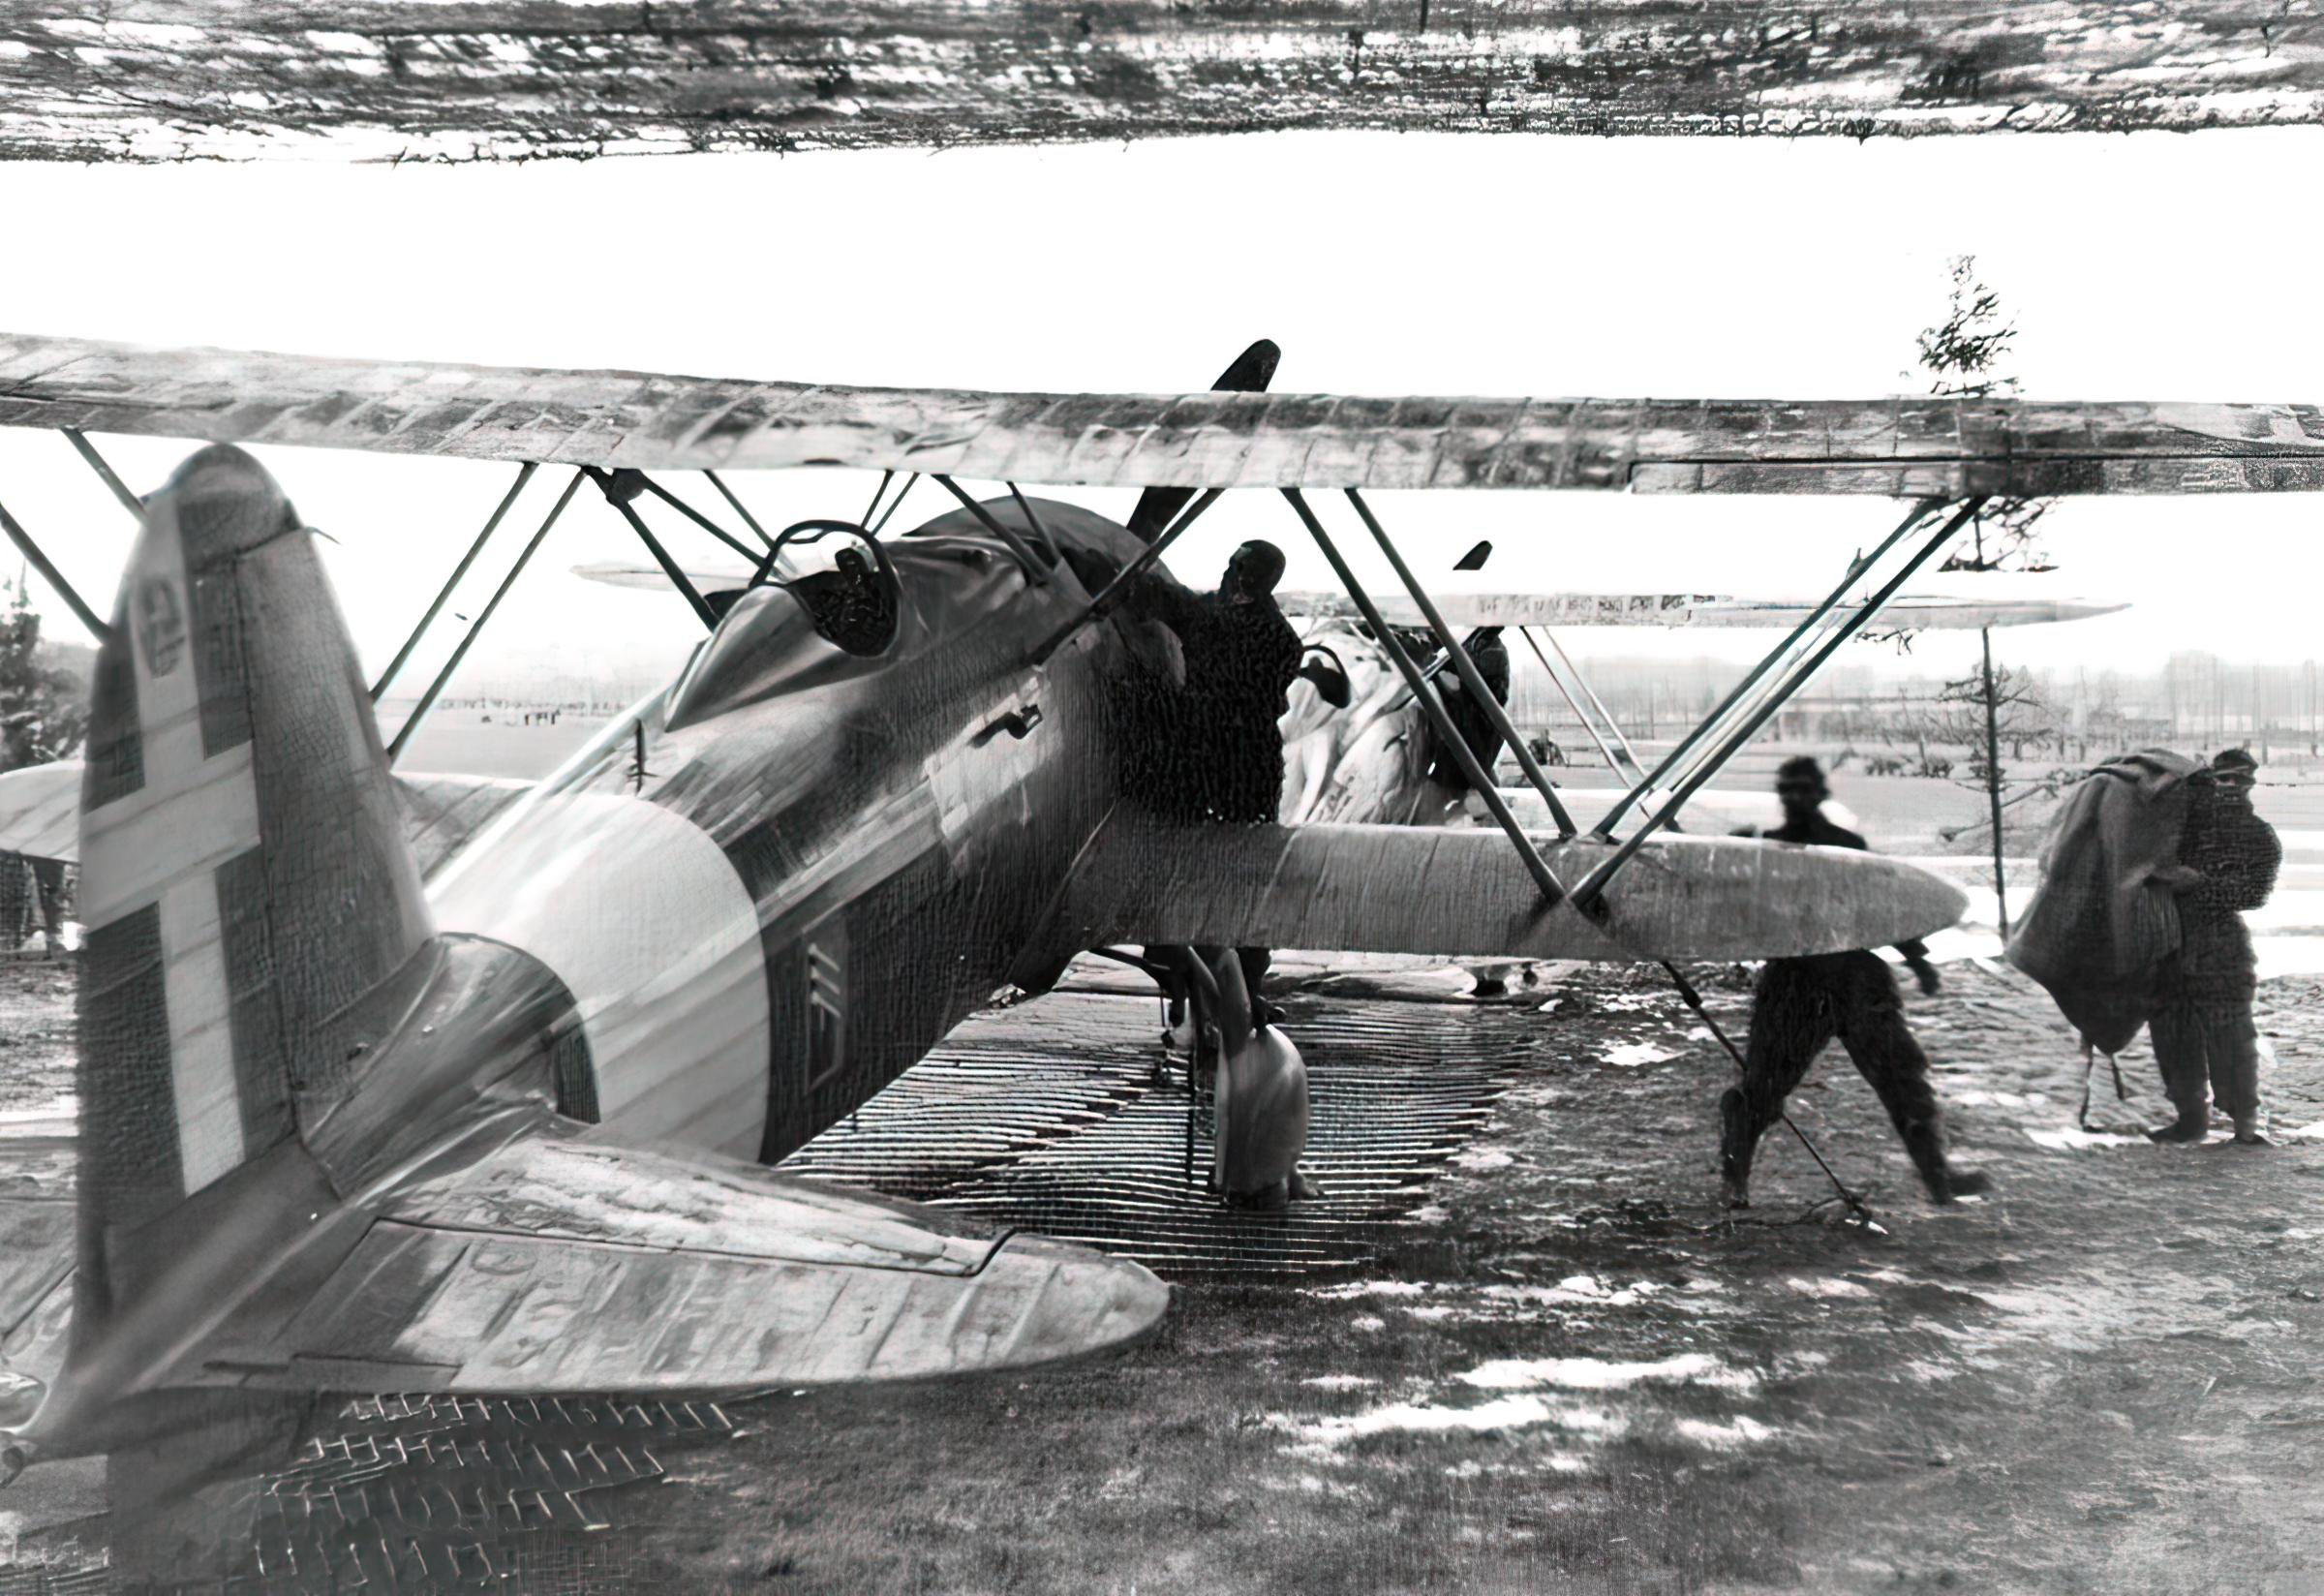 Fiat CR 42 Falco 18.JG56 18 Gruppo Ursel Belgium 1940 01